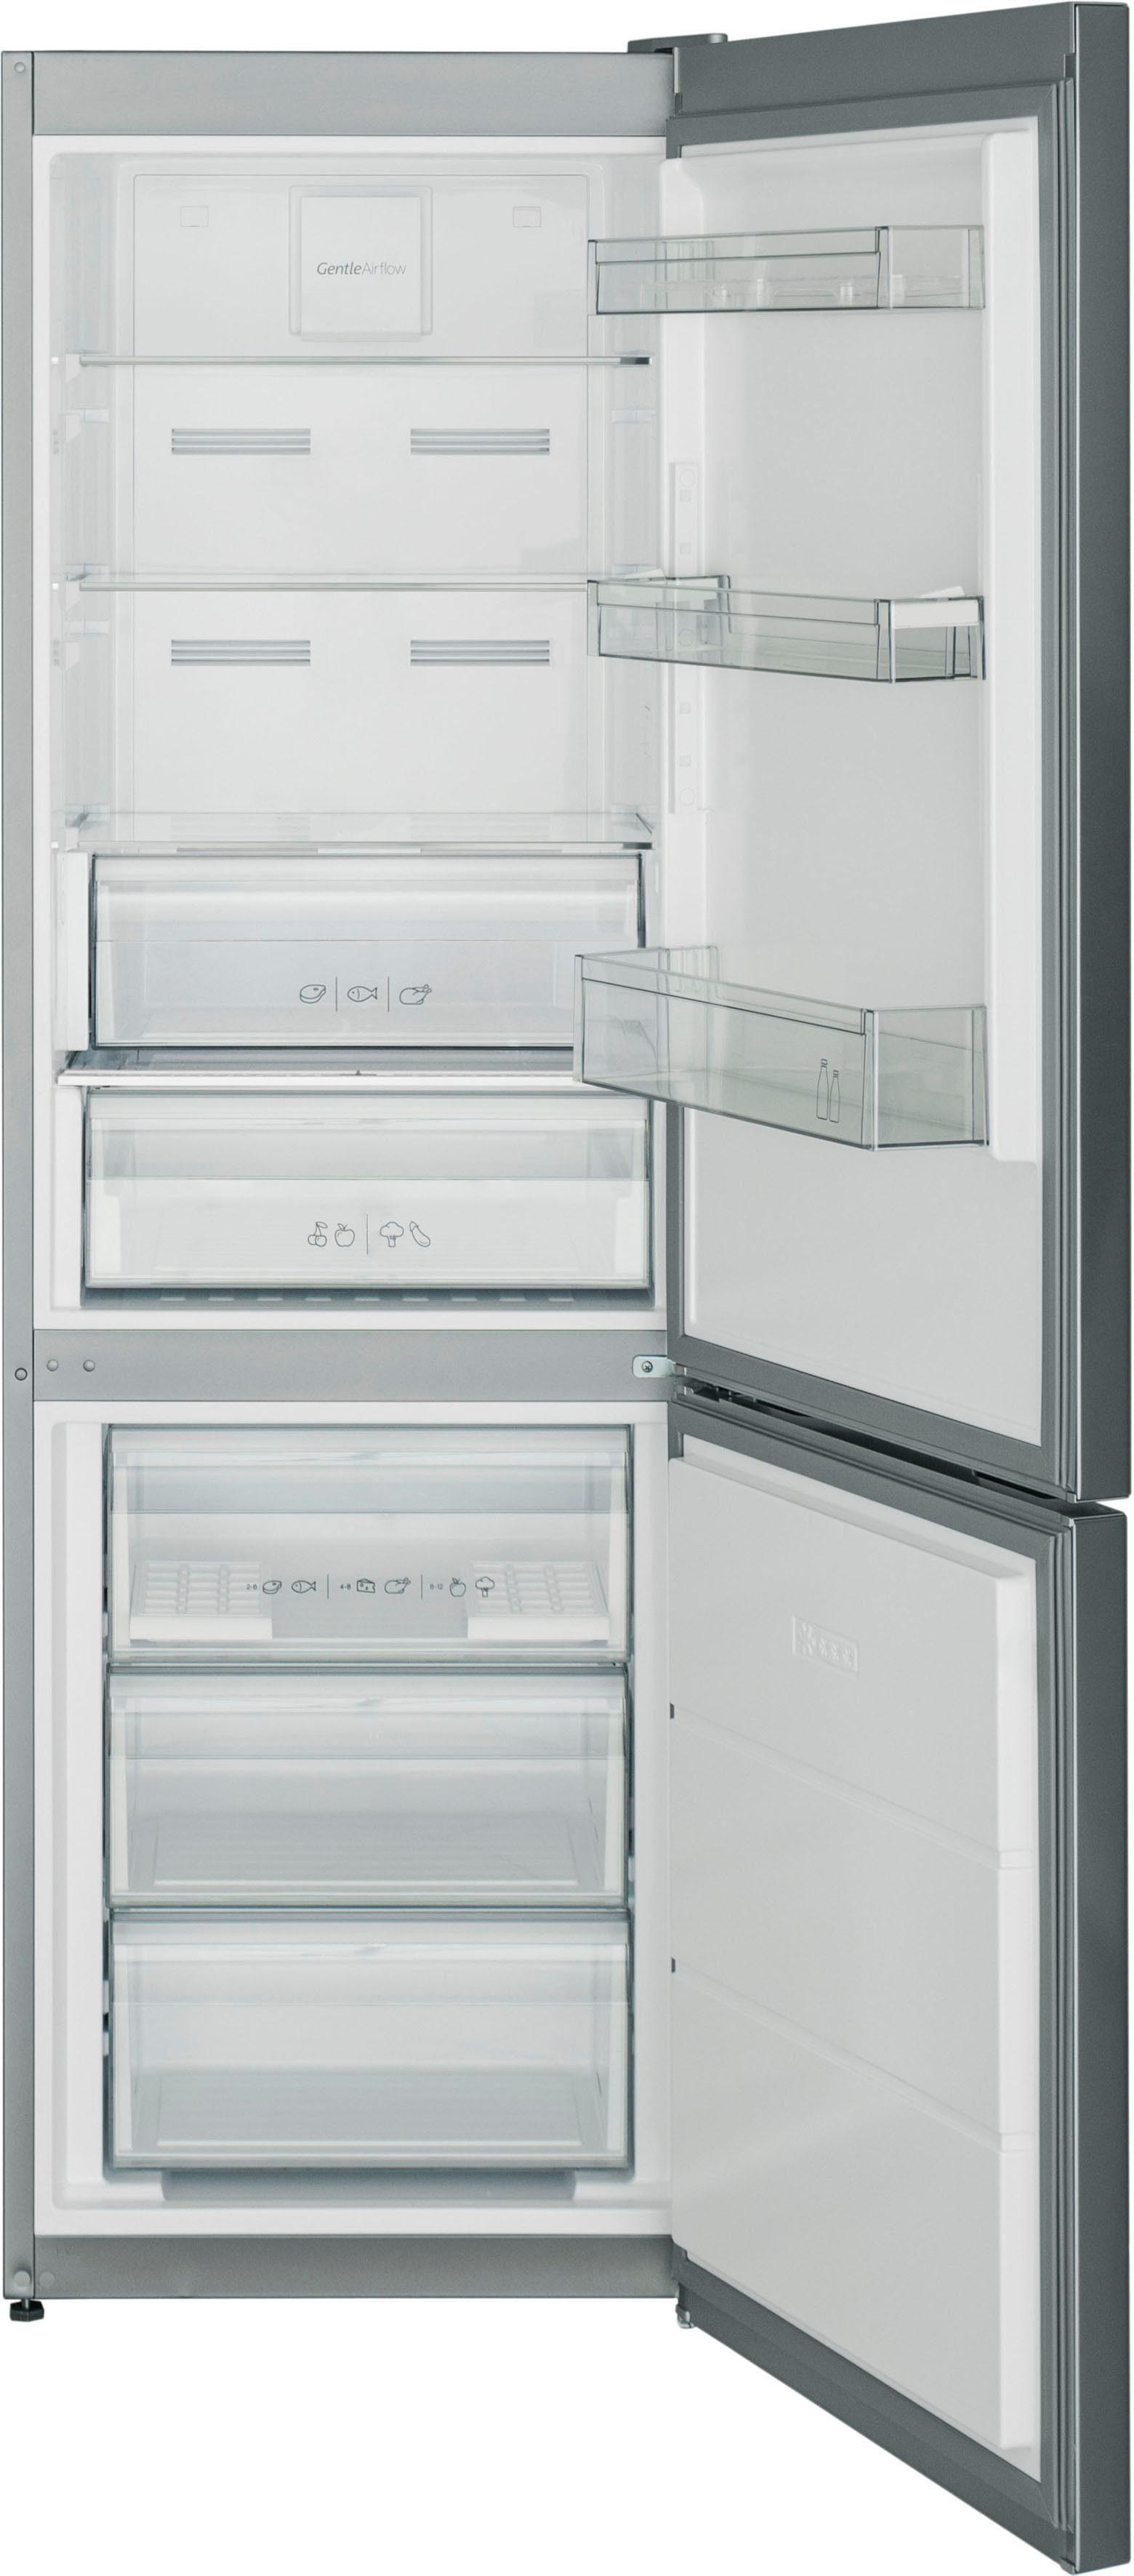 Sharp Kühl-/Gefrierkombination SJ-BA10IEXI2-EU, 186 cm hoch, 59,5 cm breit